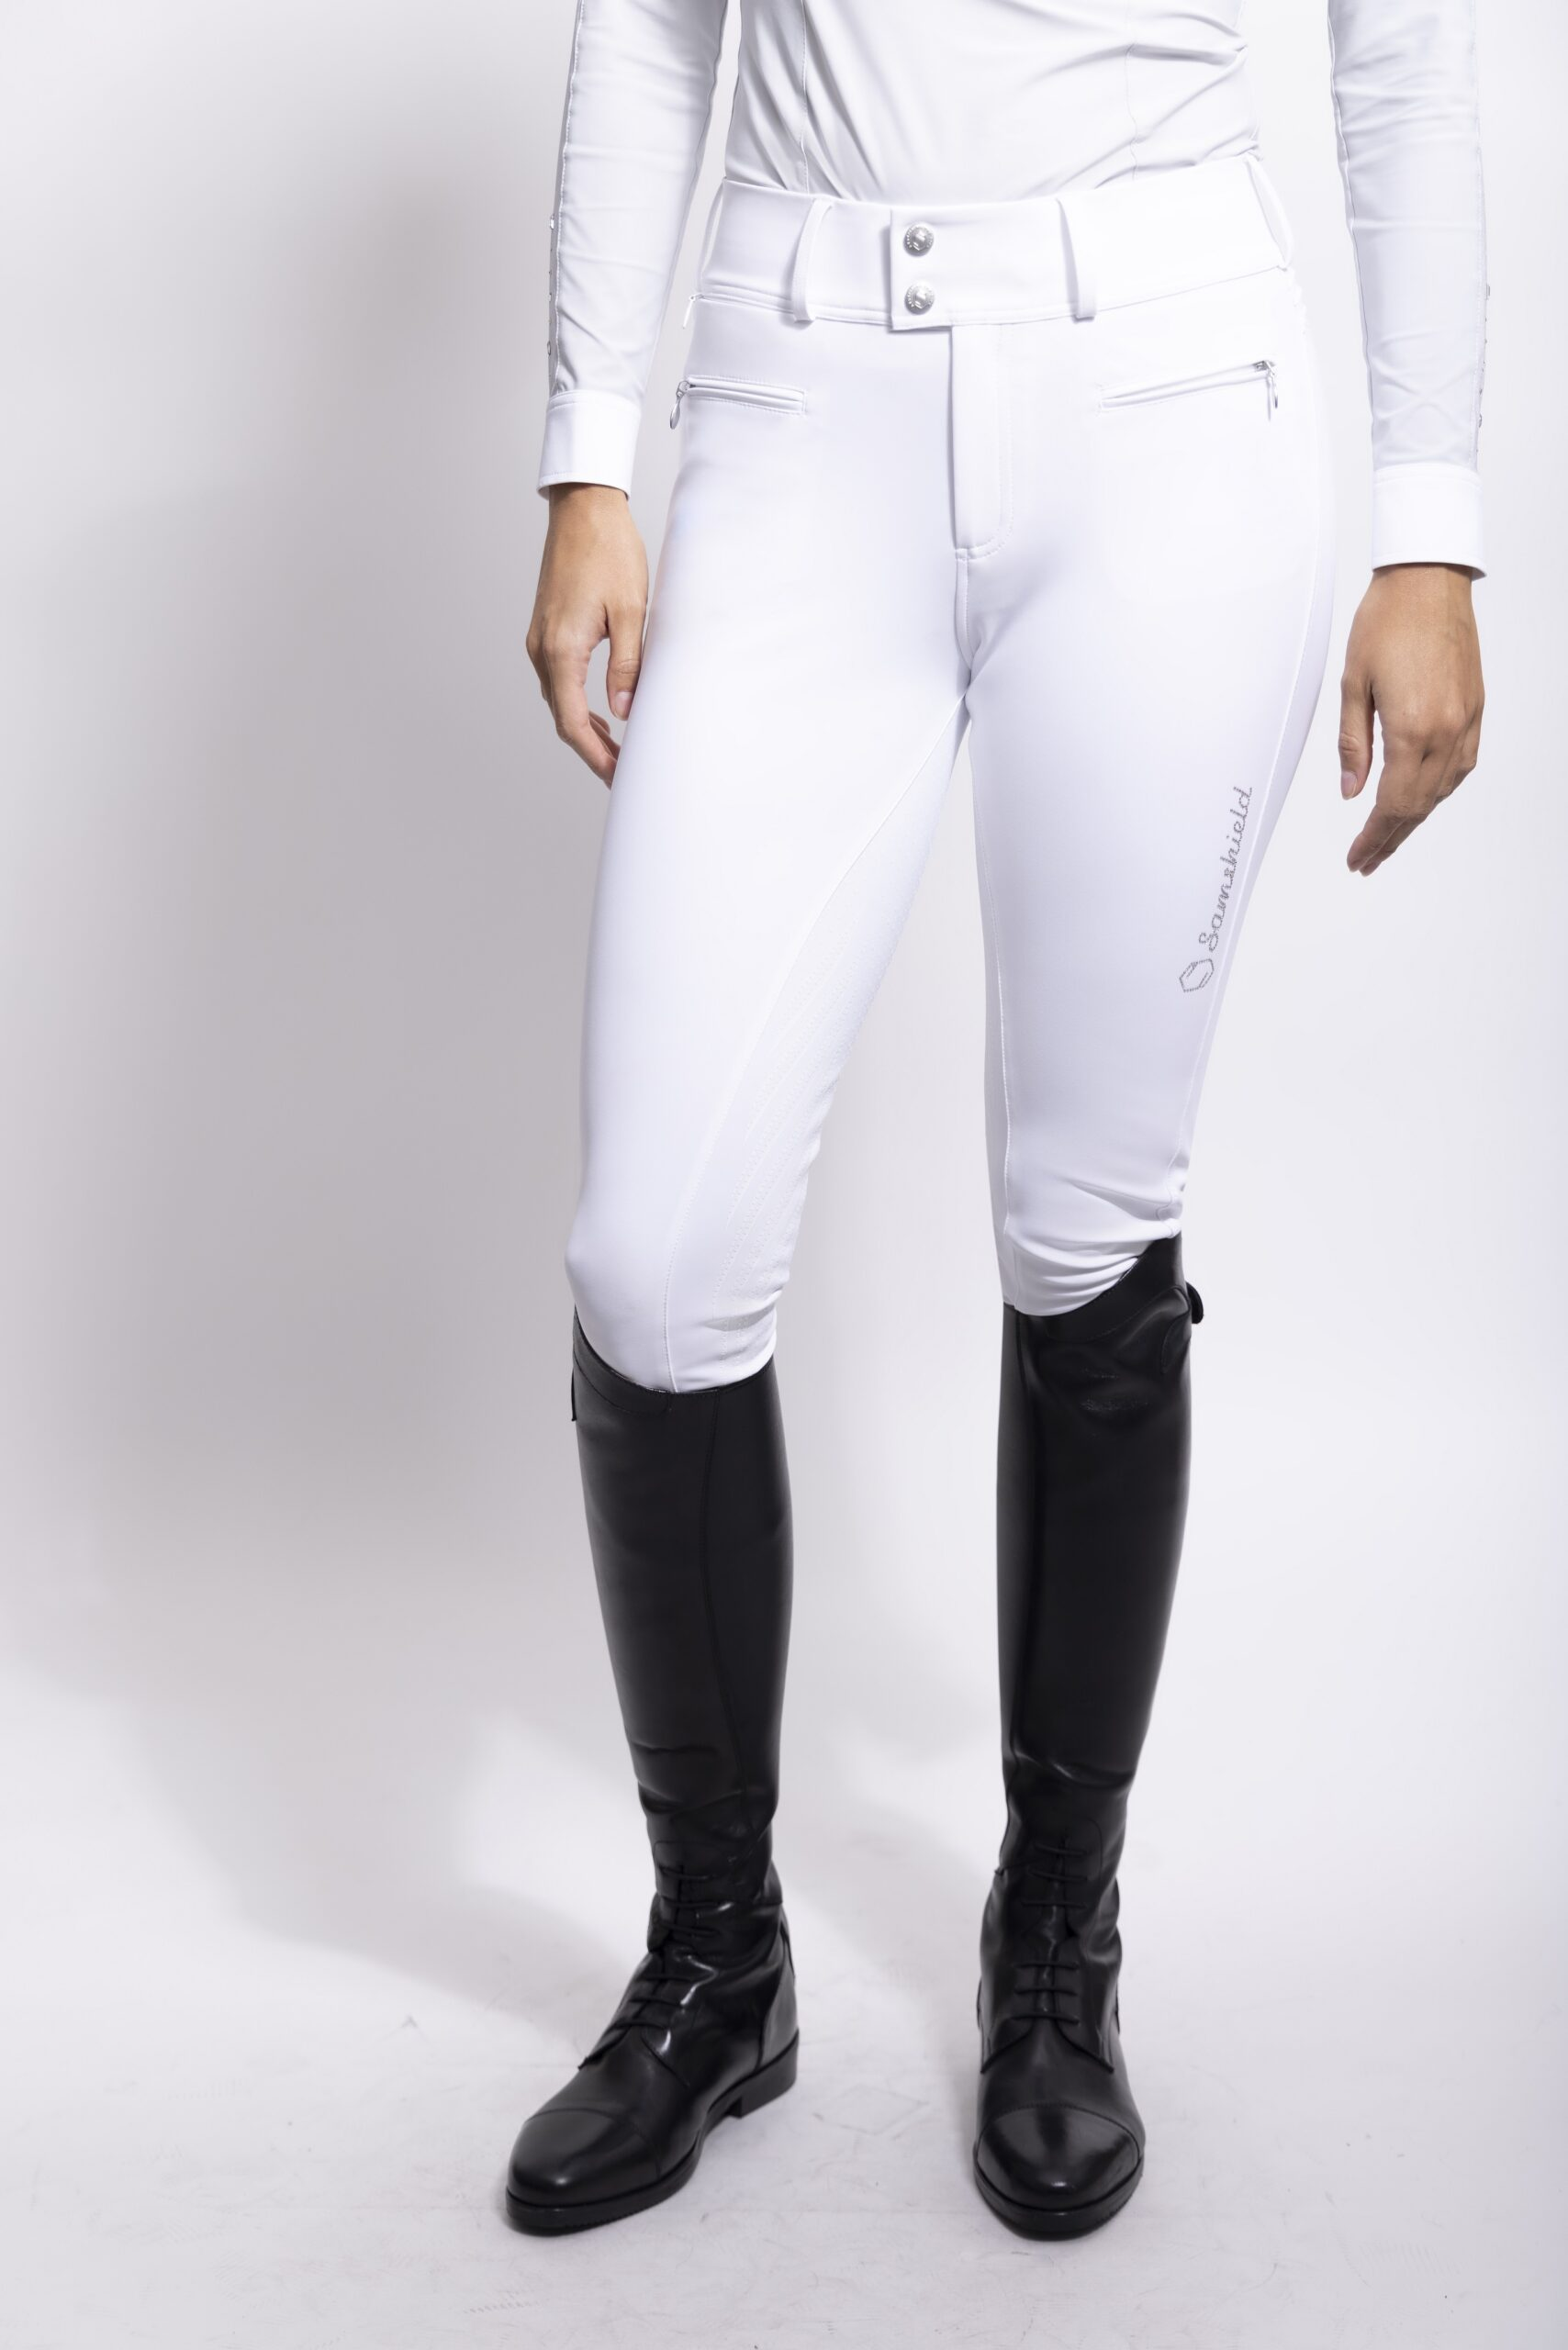 Samshield-Rijbroek-FW21-Clara-Tontone-white